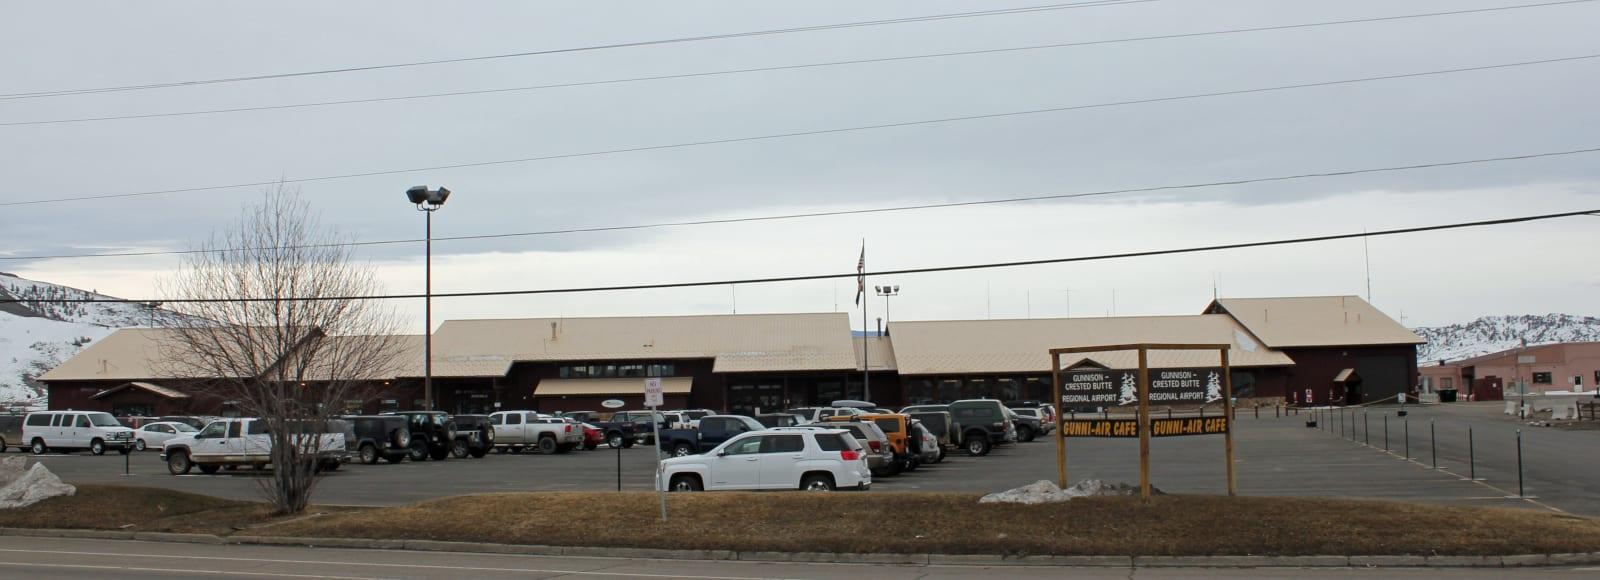 Gunnison-Crested Butte Regional Airport Terminal Buildling